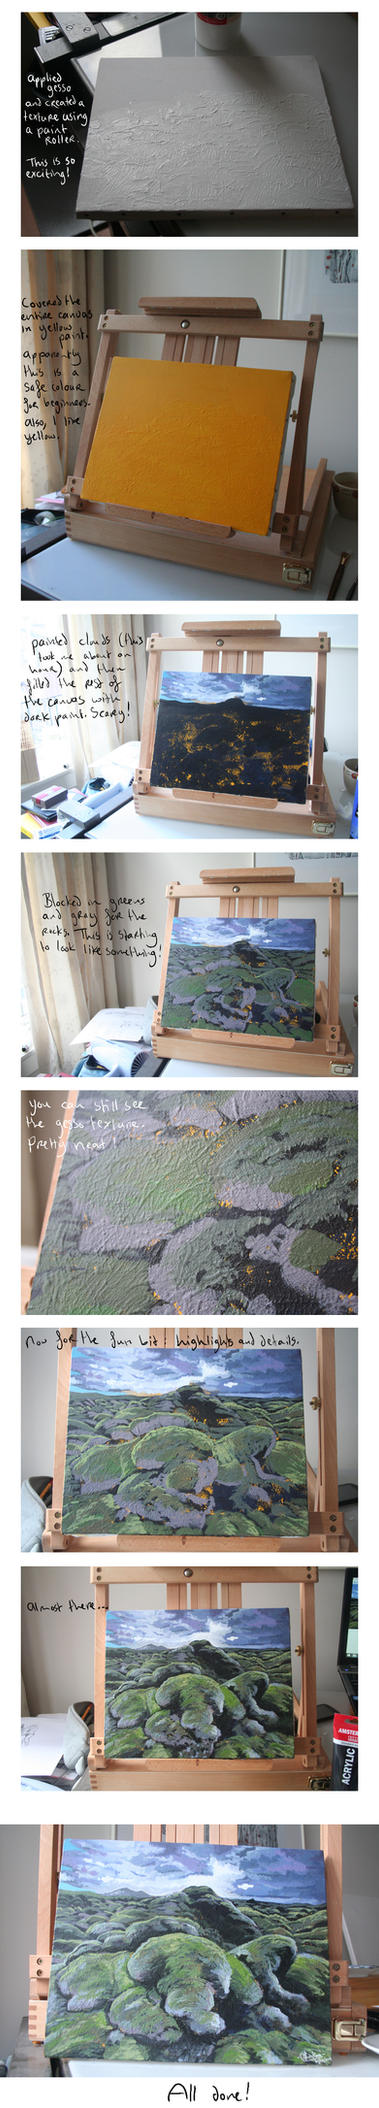 Acrylic painting with gesso texture - Process by SaskiaDeKorte